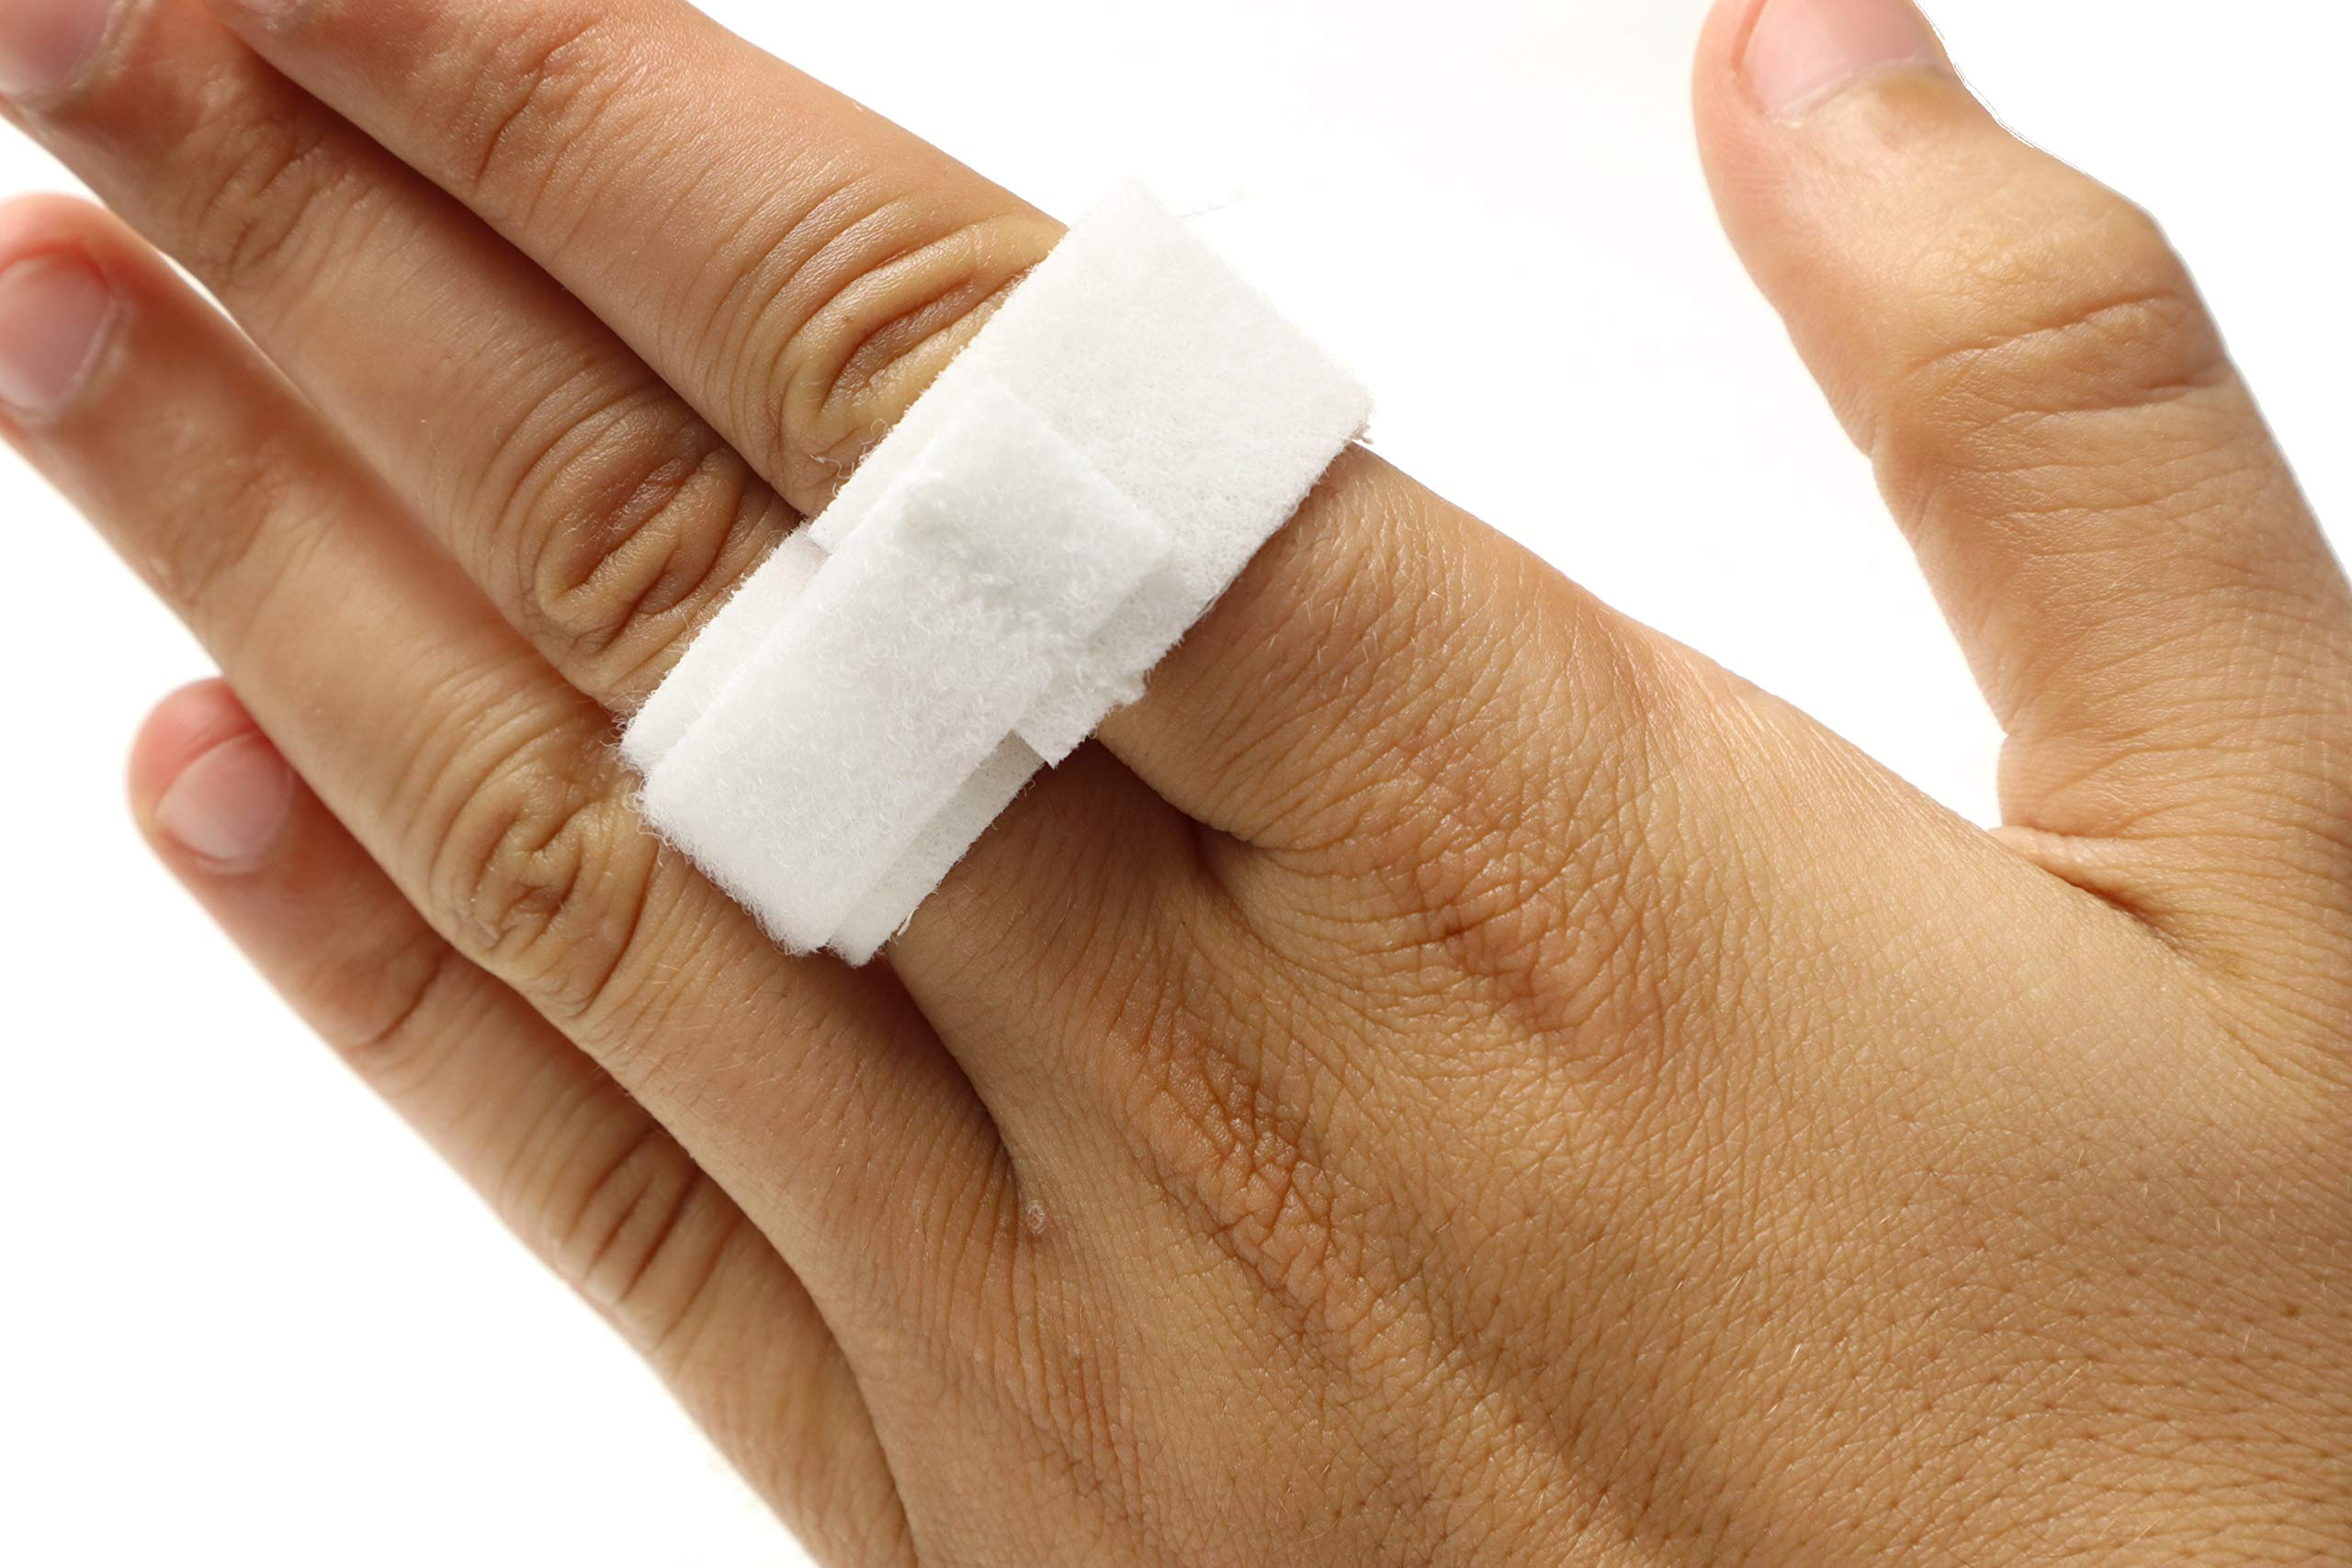 Finger Splint Buddy Tape for Jammed and Broken Fingers - 3/4'' Wide - Pack of 5